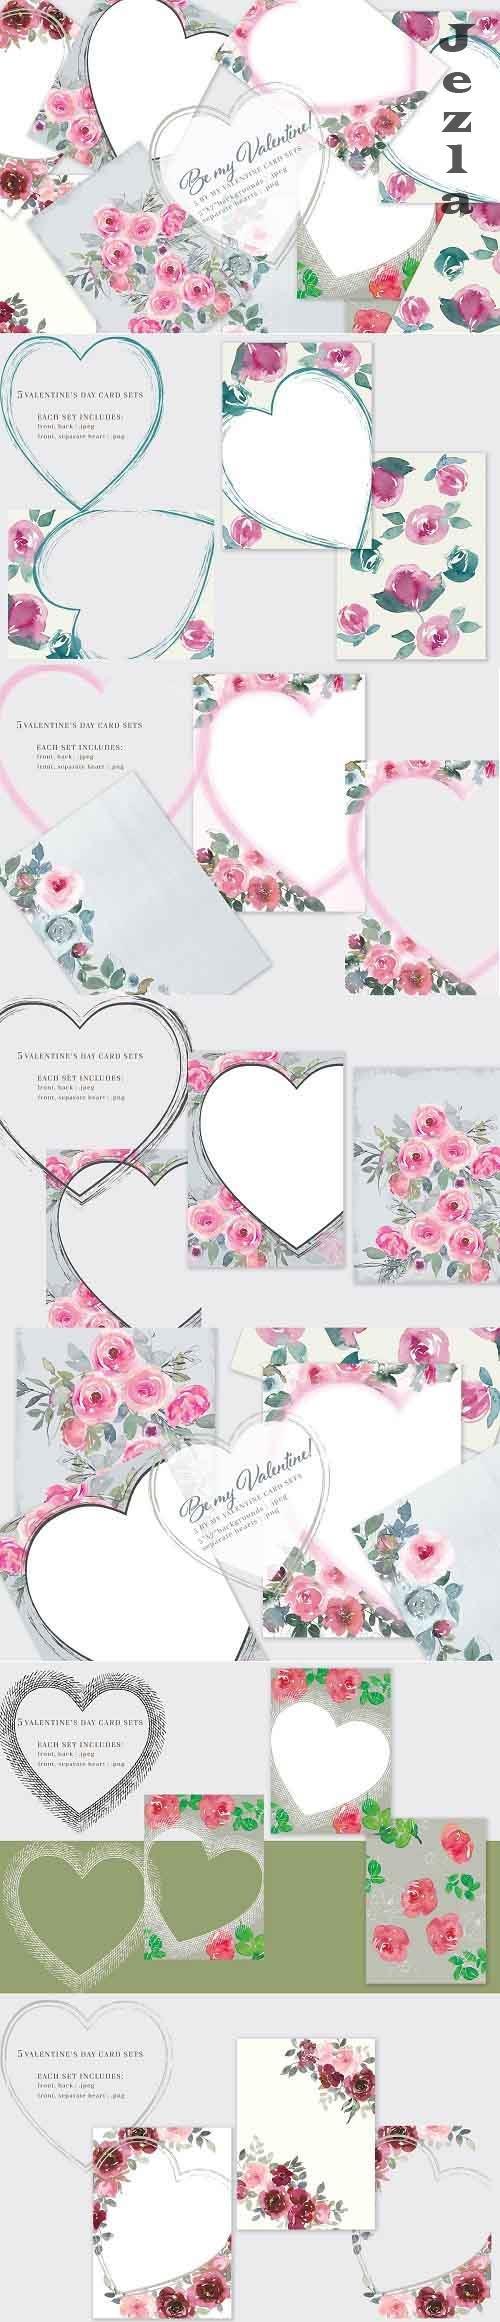 Be My Valentine Printable Cards 5x7  - 5778280